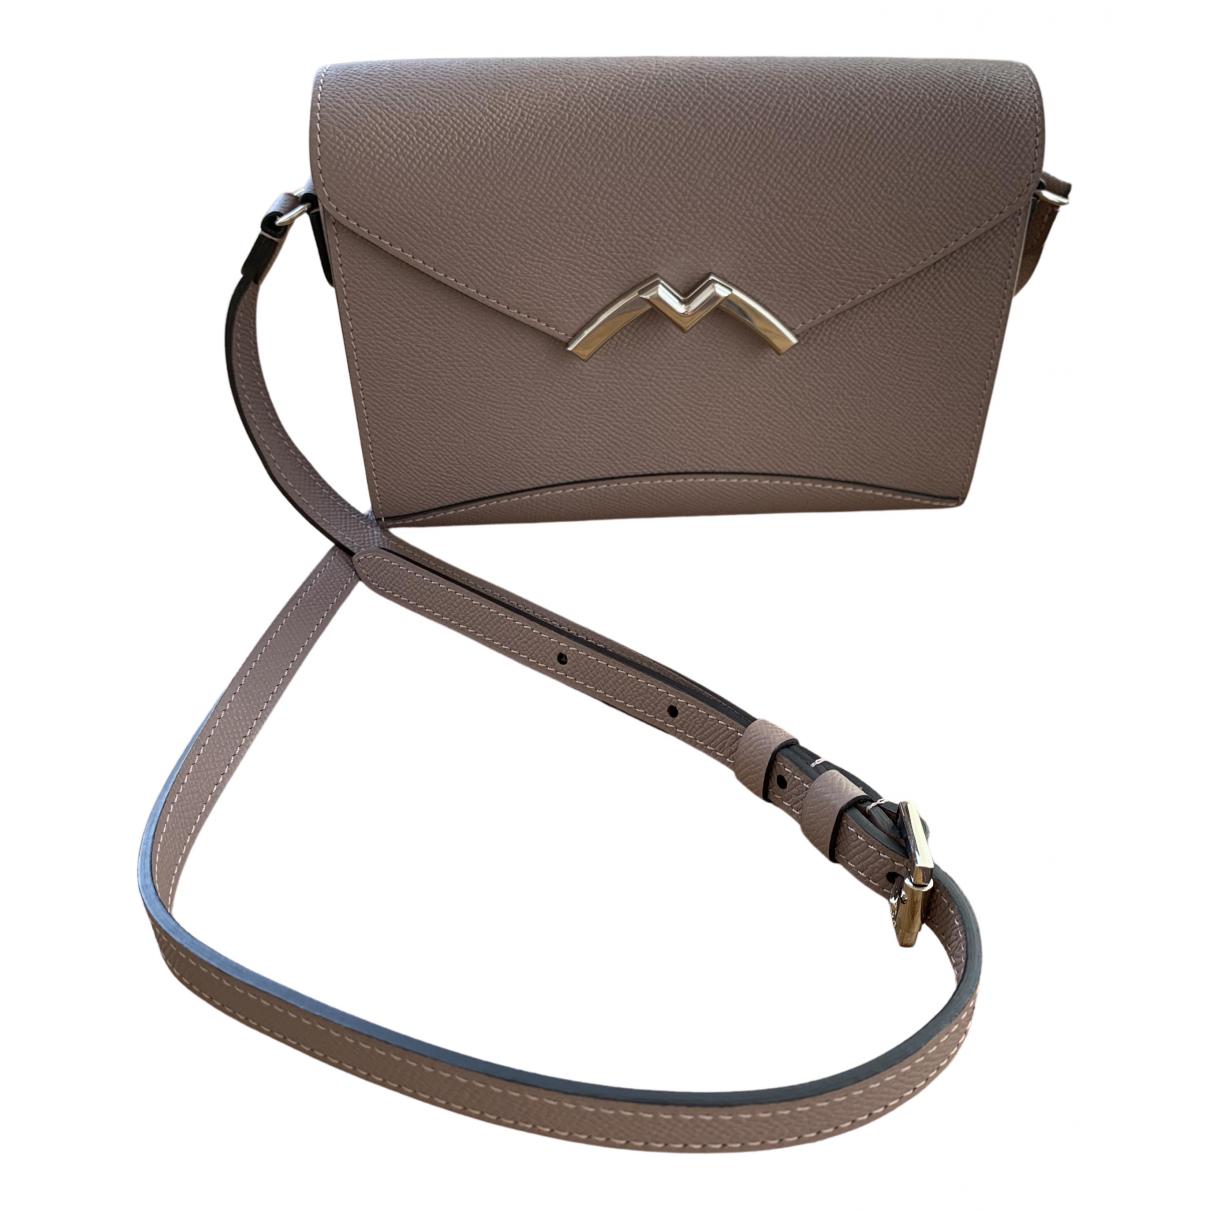 Moynat Paris \N Beige Leather handbag for Women \N